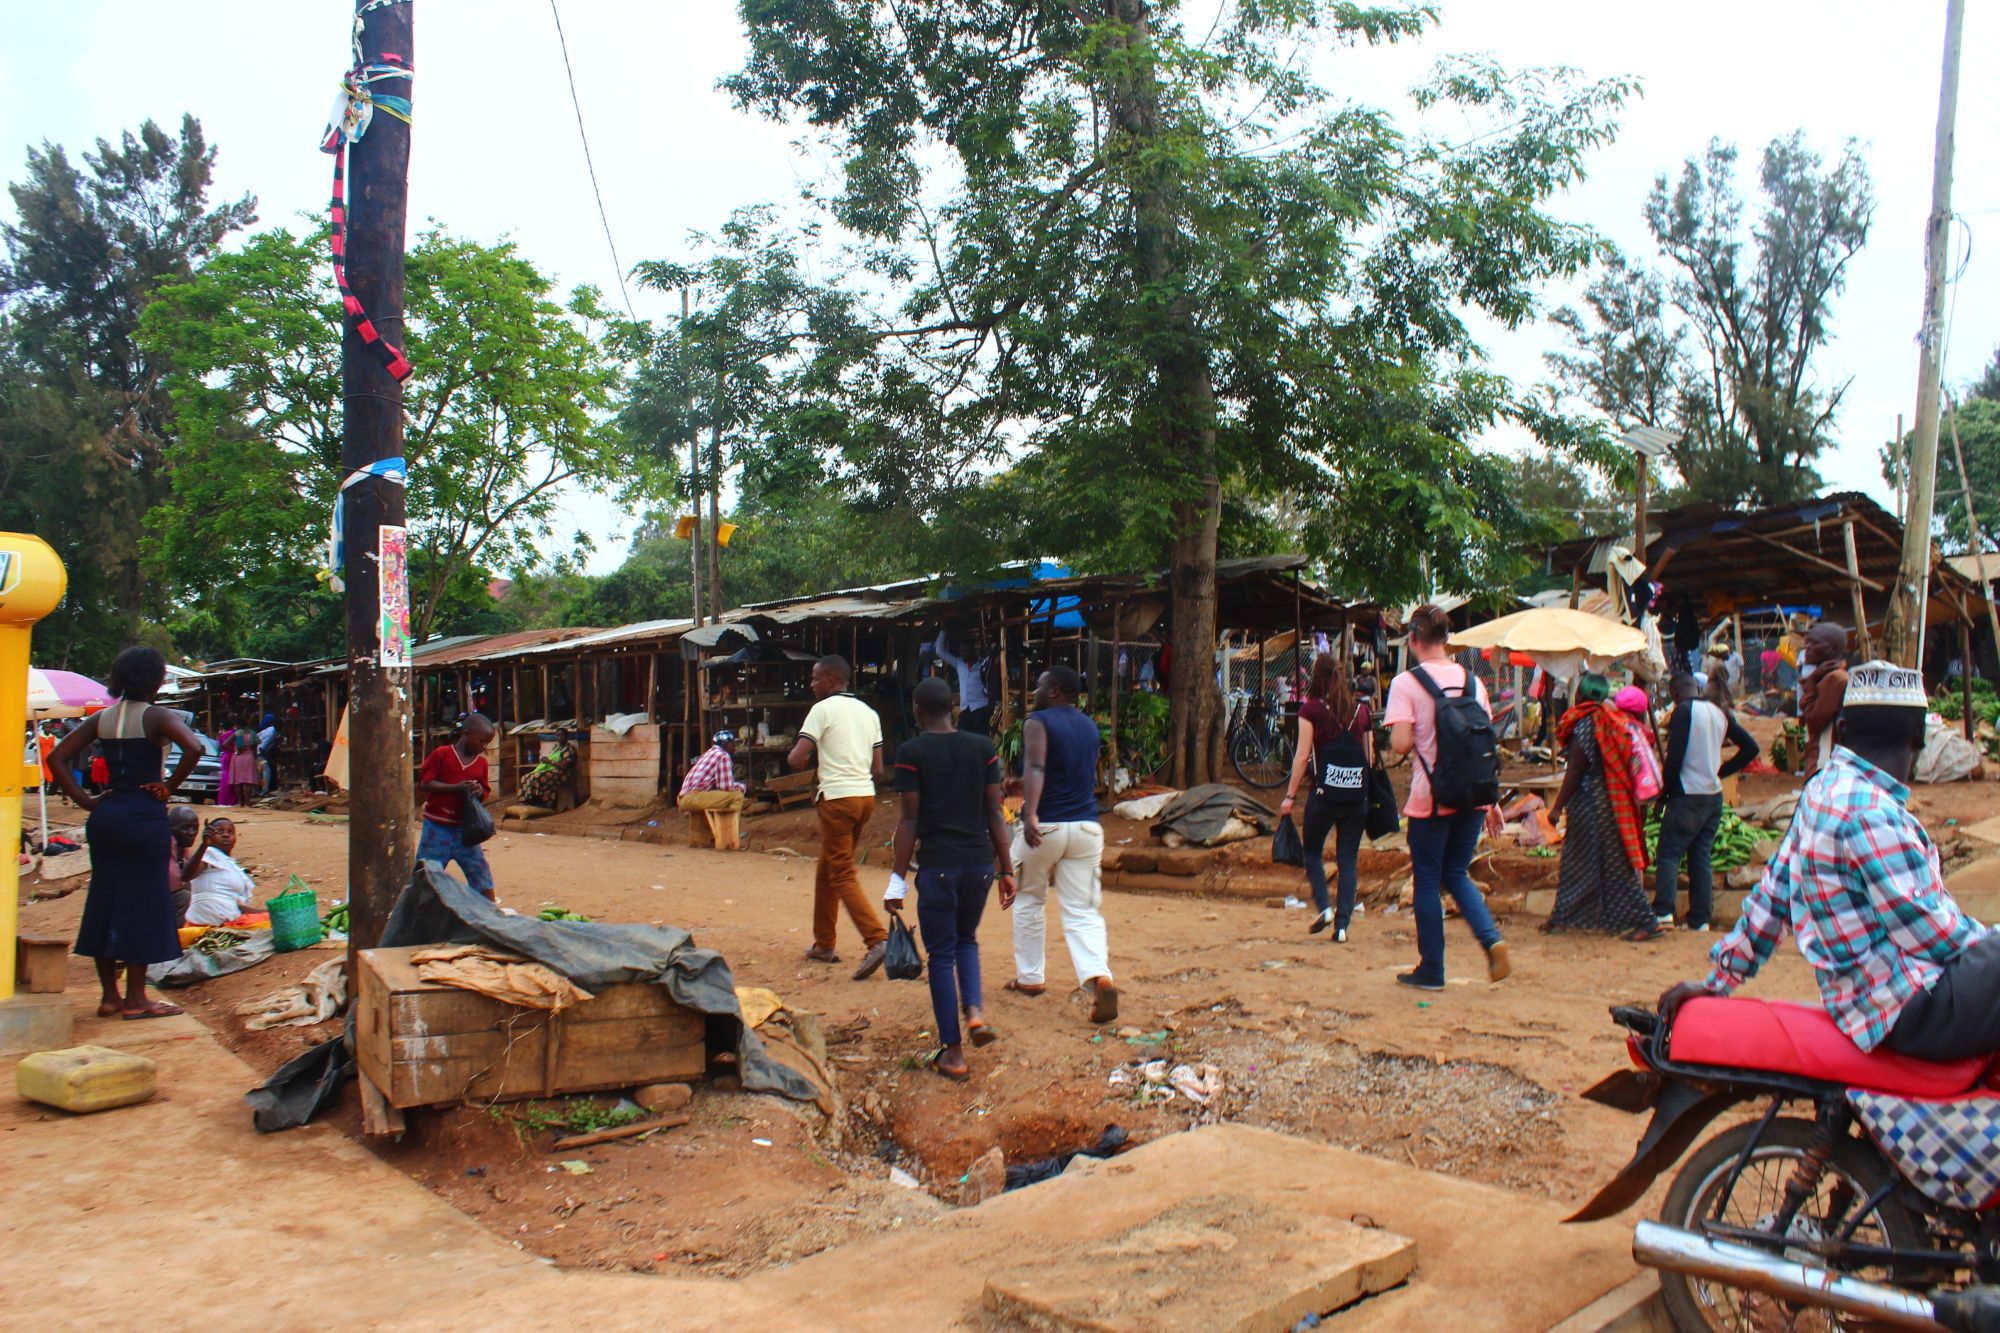 Marktplatz in Masaka